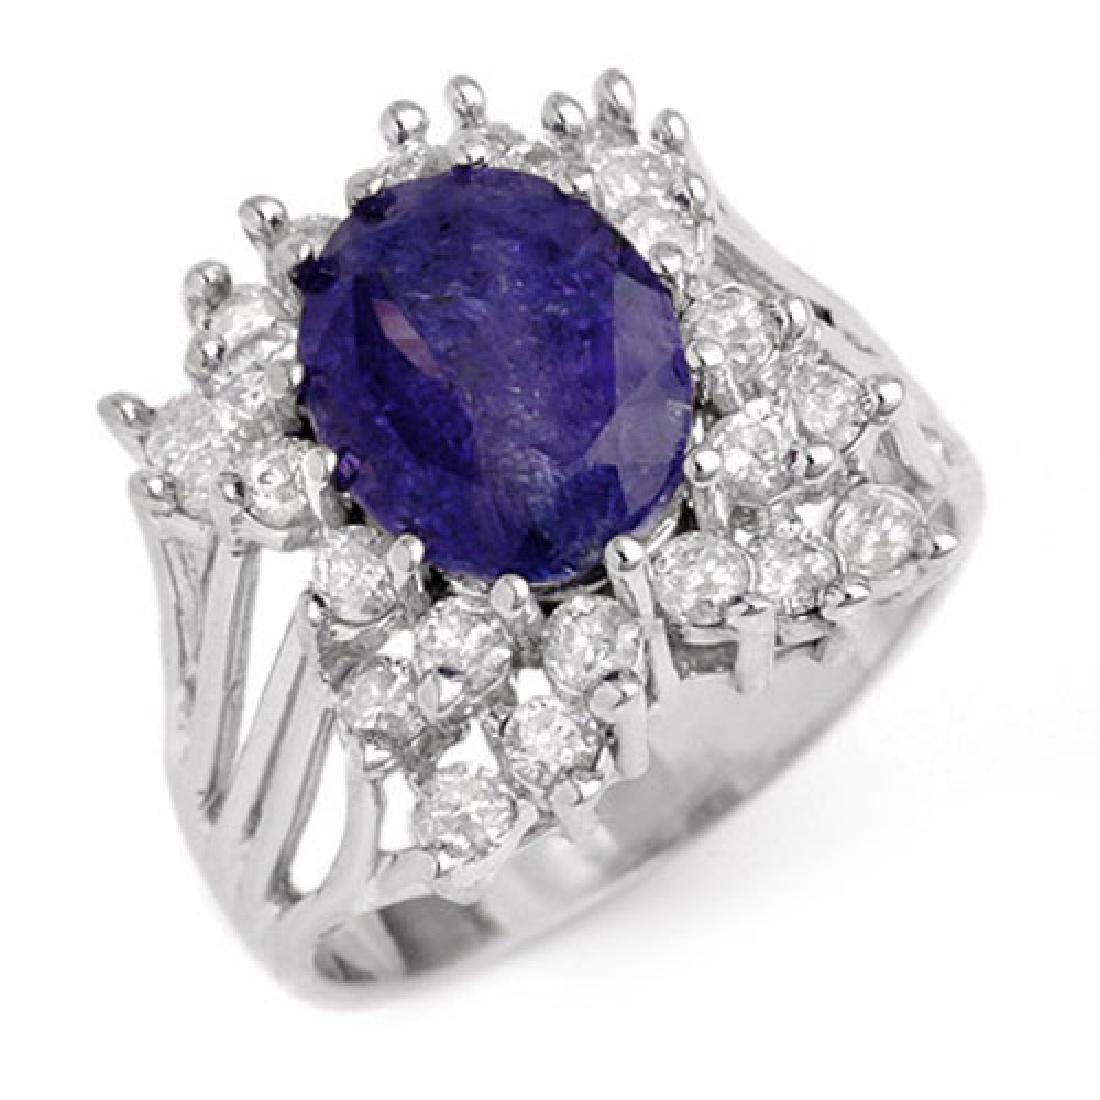 4.44 CTW Tanzanite & Diamond Ring 14K White Gold